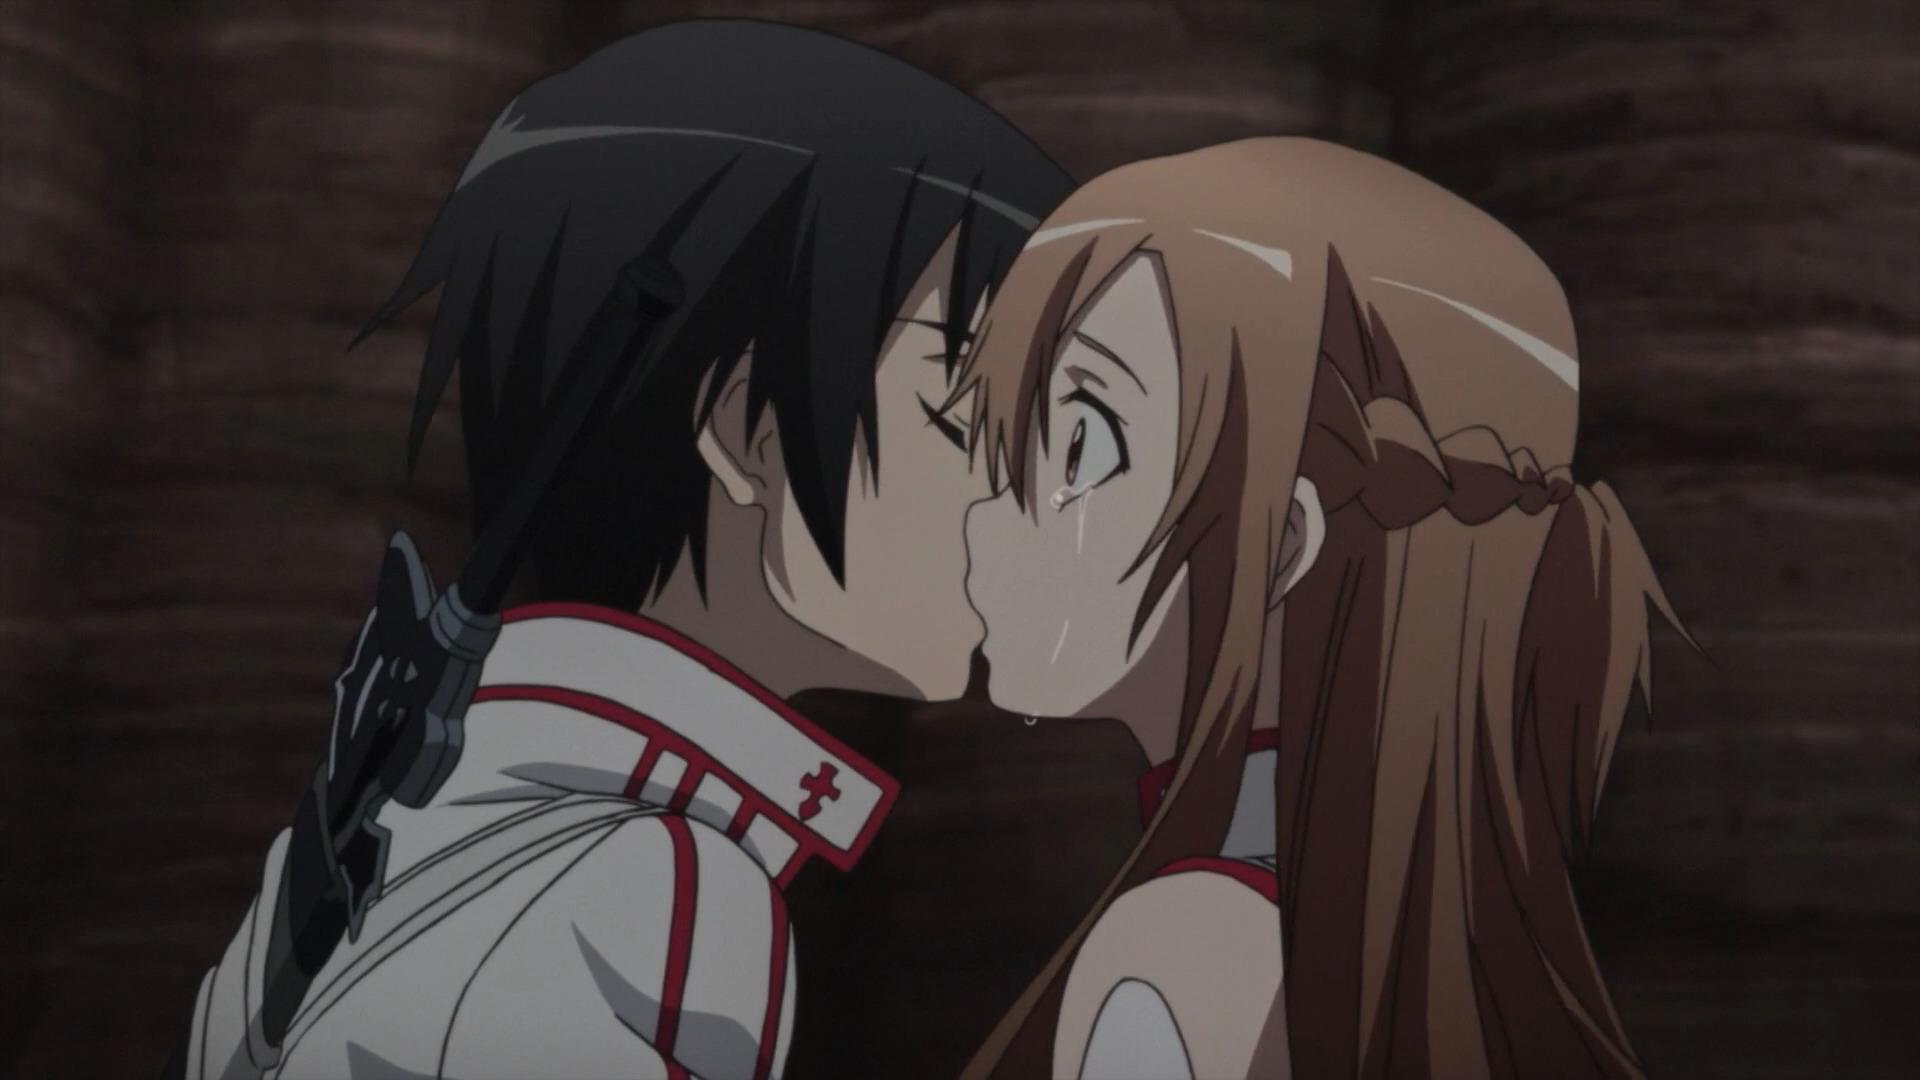 kirito kiss asuna